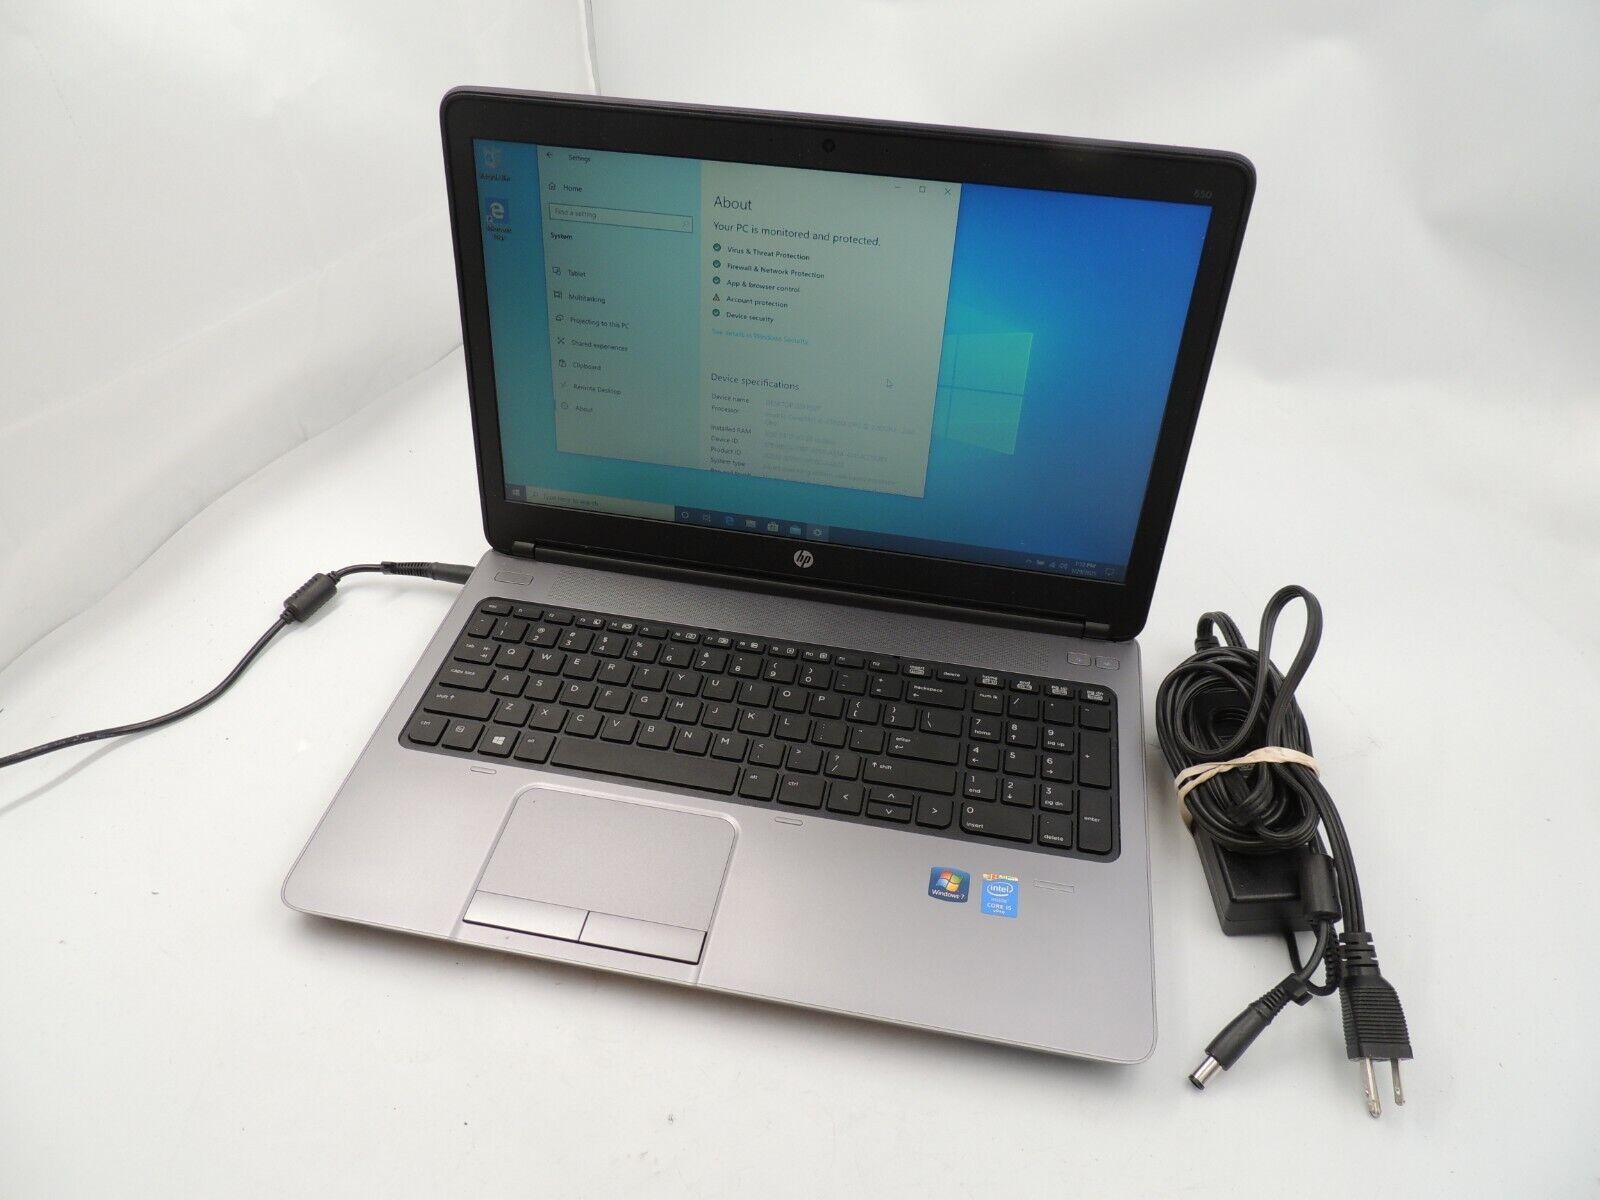 HP ProBook 640 G1  Core i5 4200M  8 GB RAM  320 GB Win 10 Pro